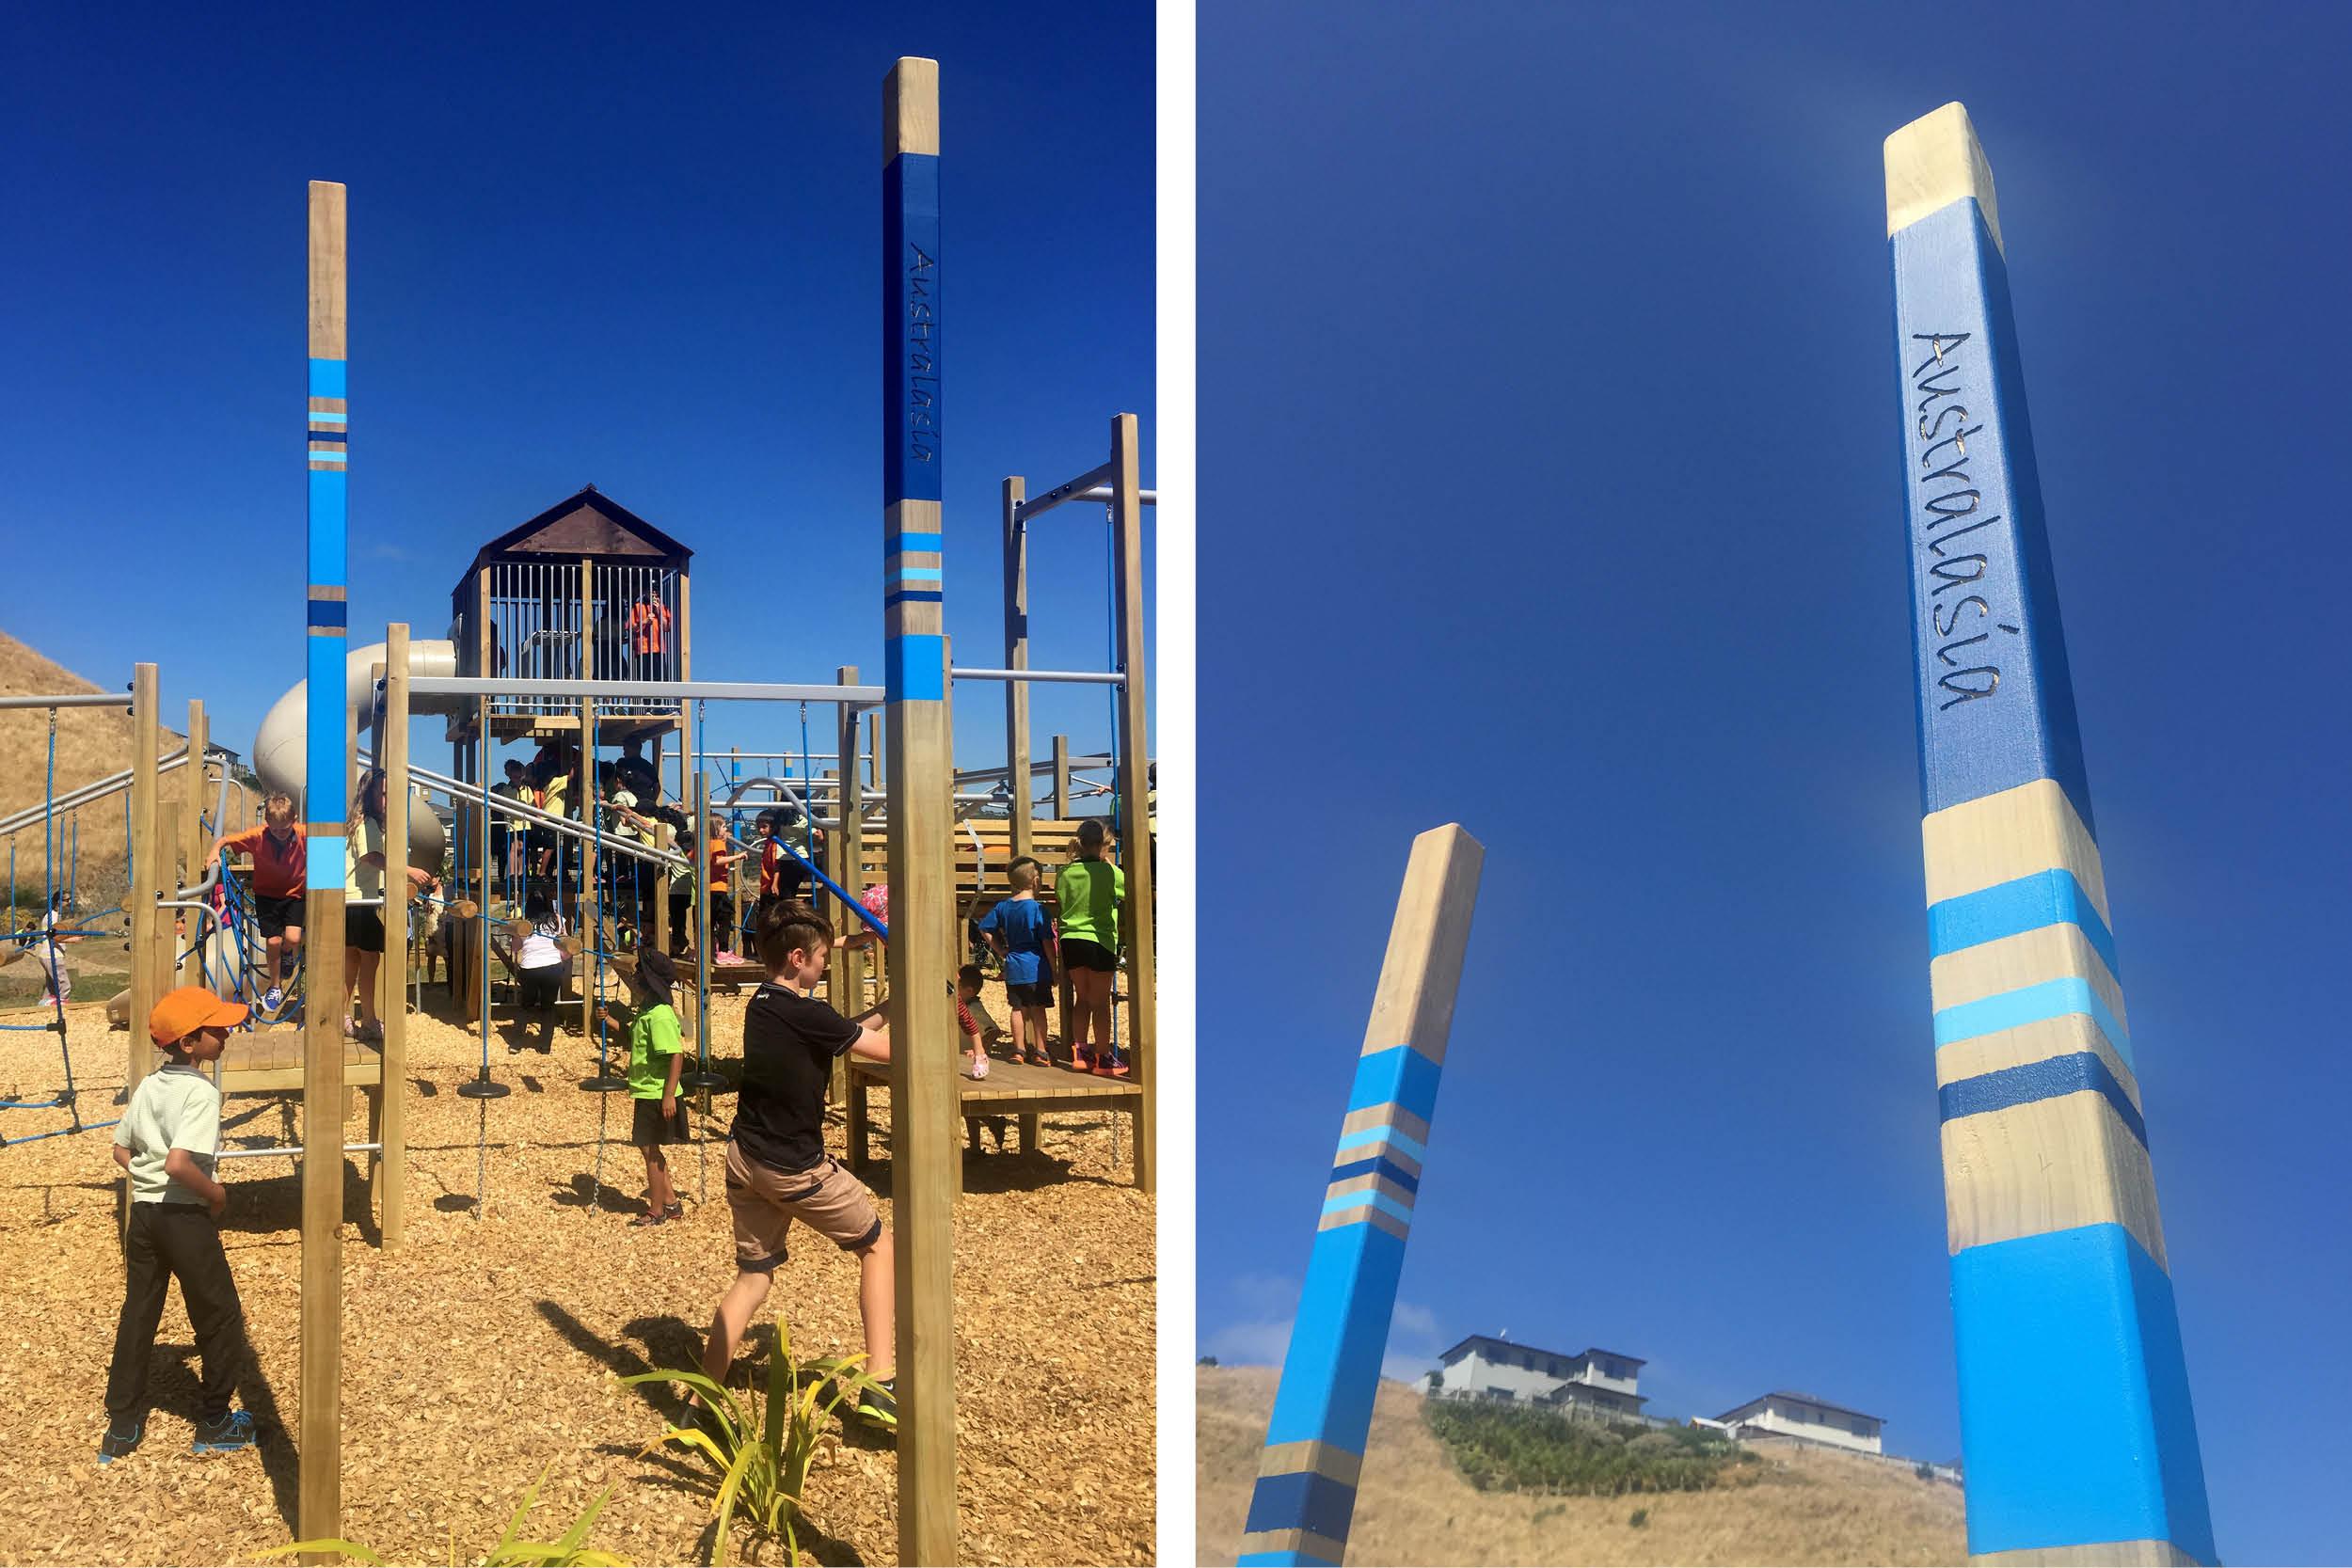 Amesbury School Playground Landscape